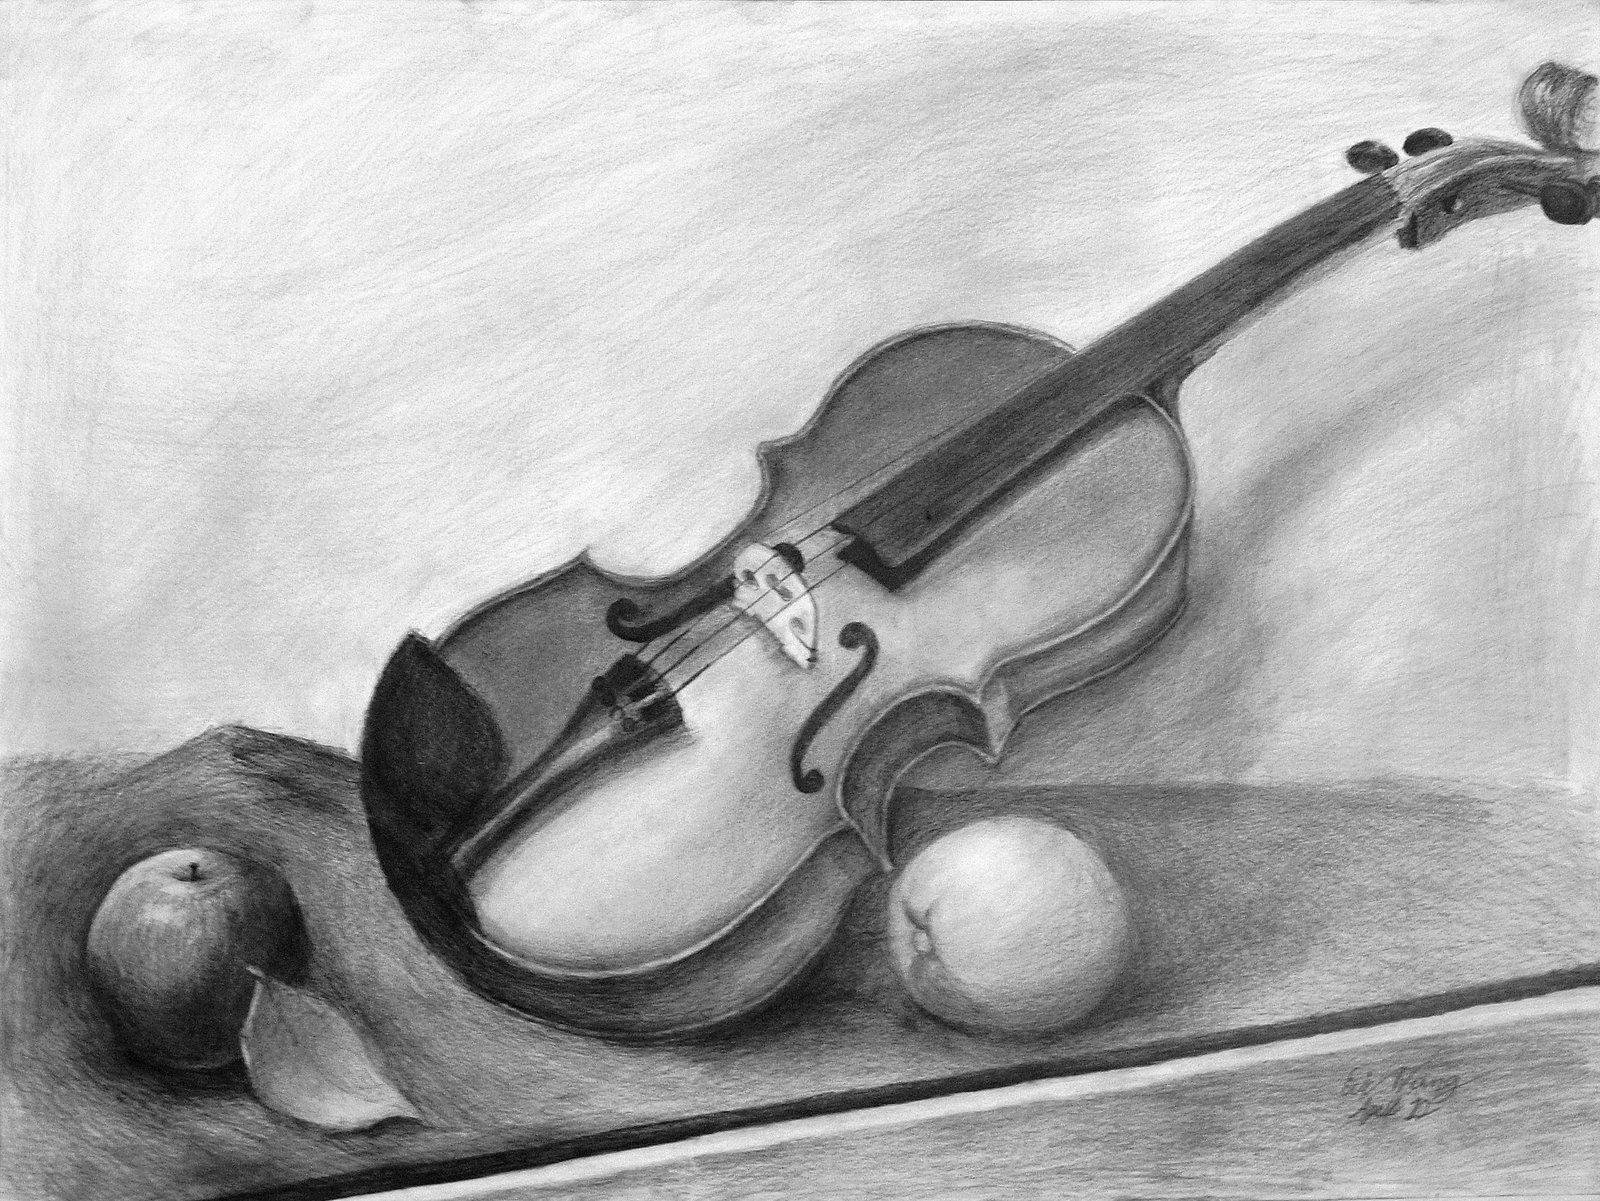 Drawn violin pencil sketch Life on by Still